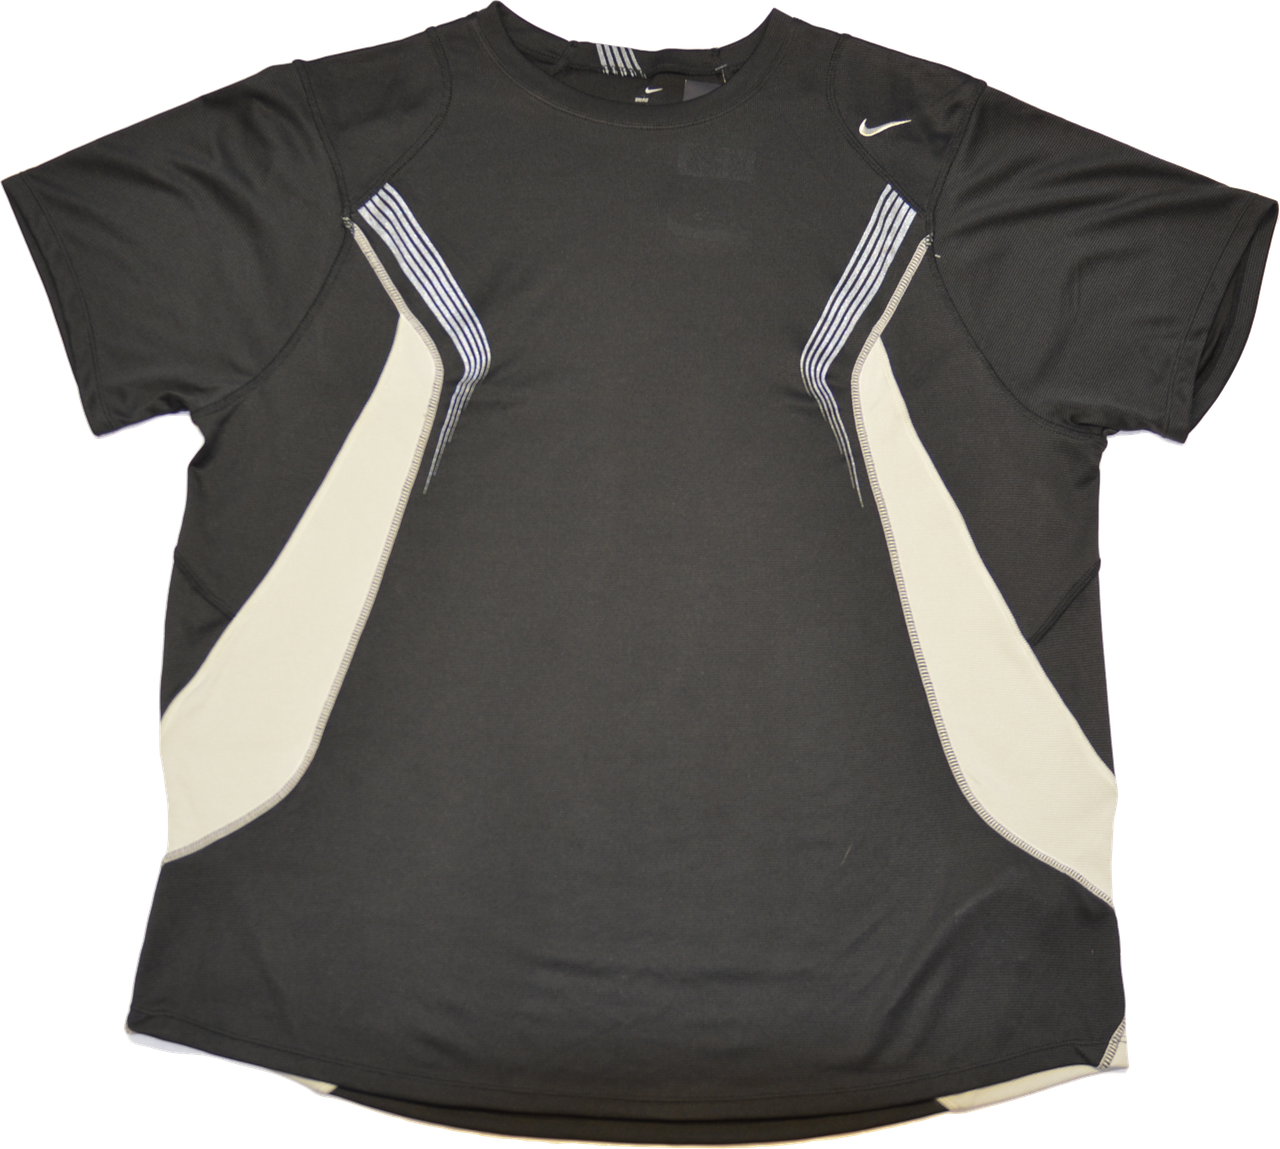 Мужская спортивная футболка Nike.